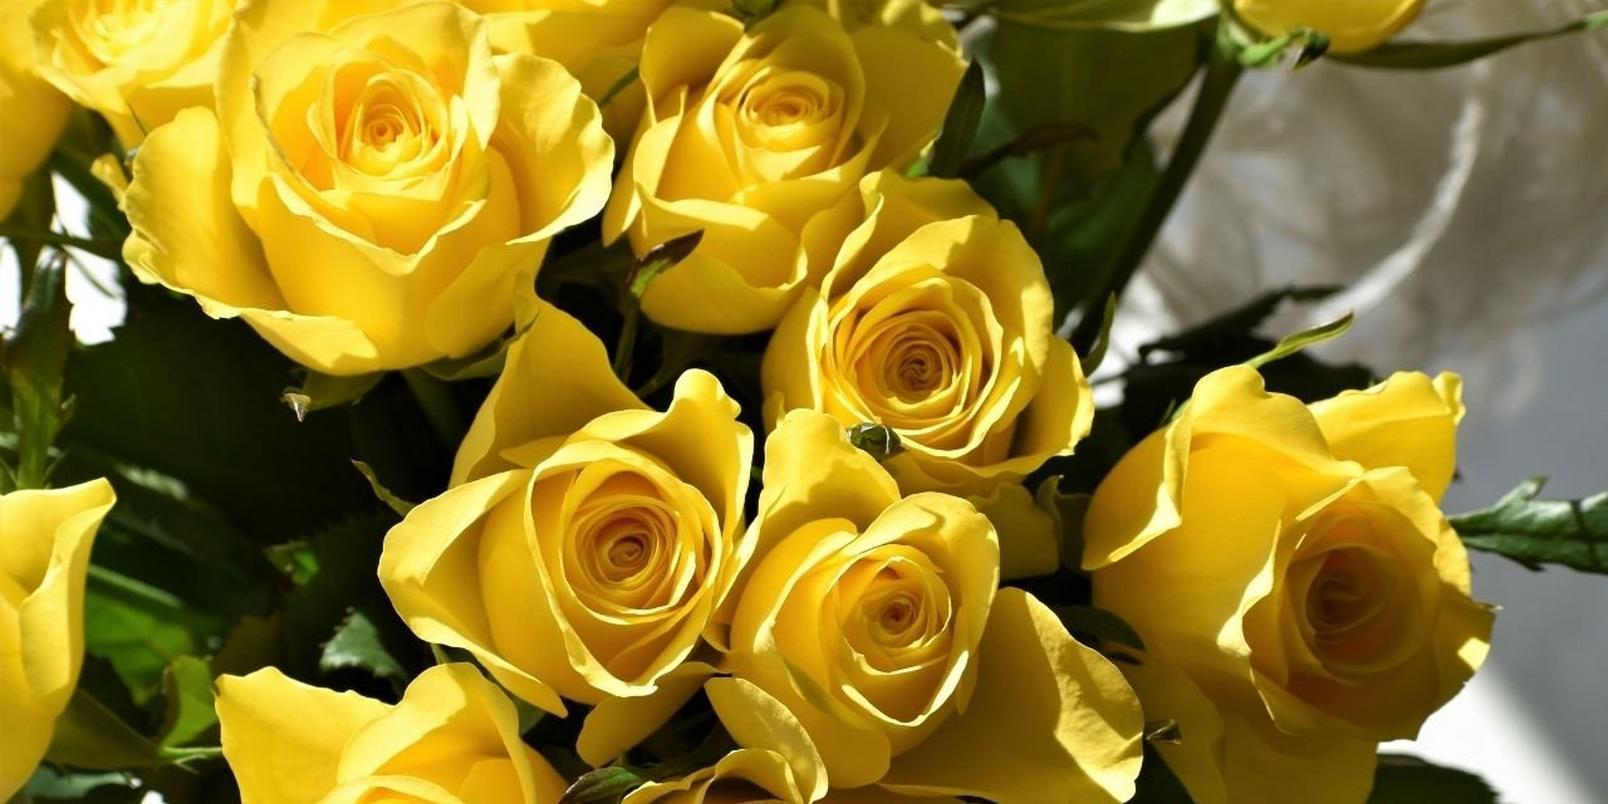 Untitled-design-92-yellow-rose